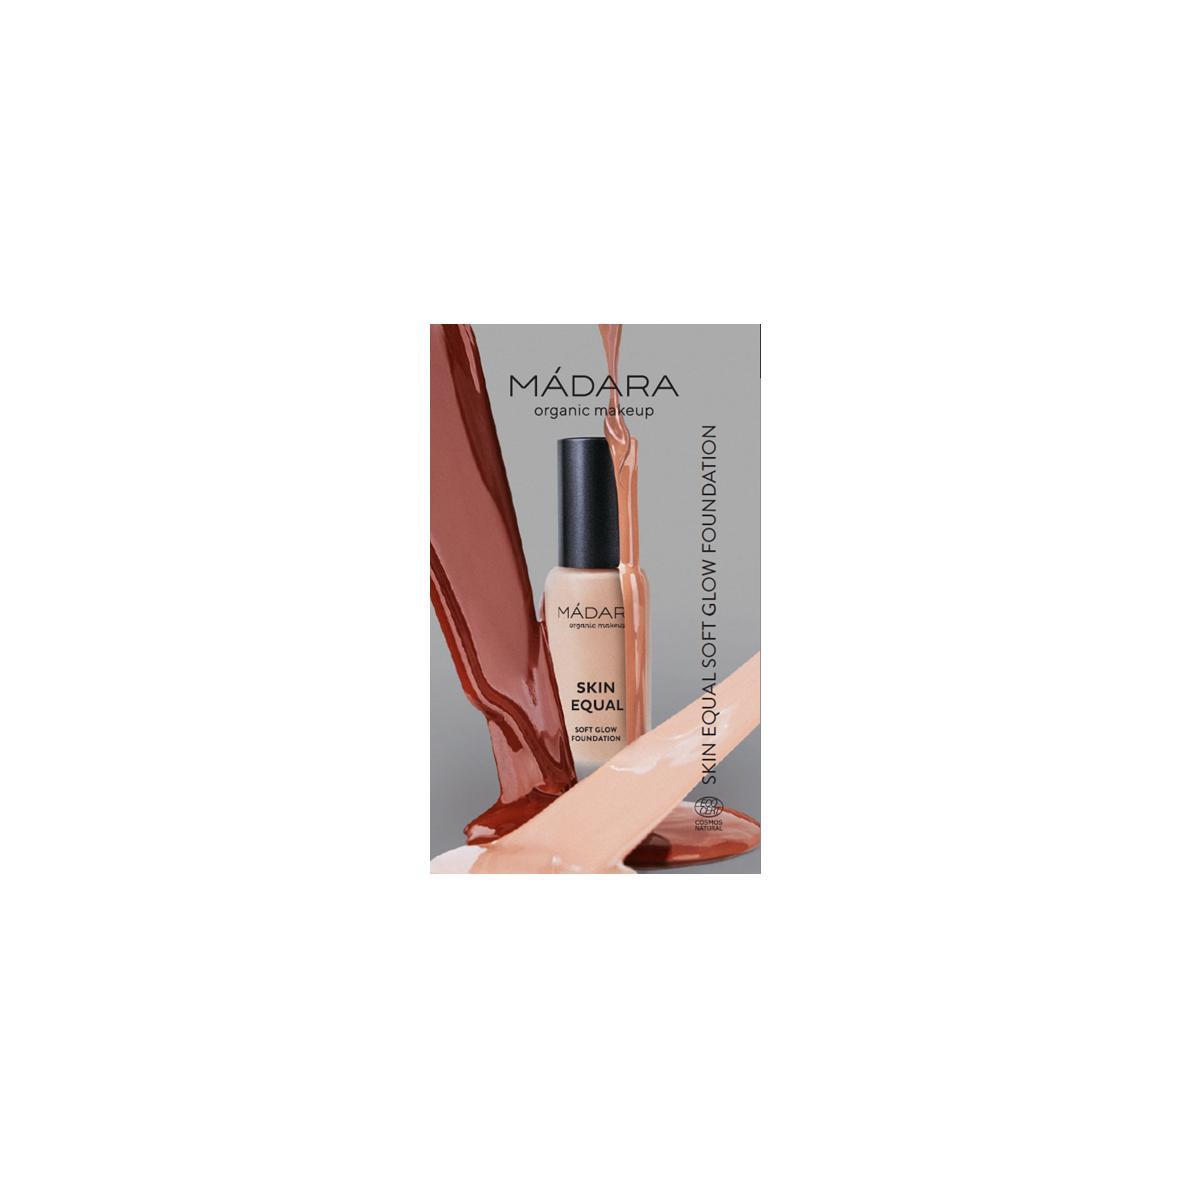 MÁDARA Make-up s SPF 15, Mocha 100 2 ml